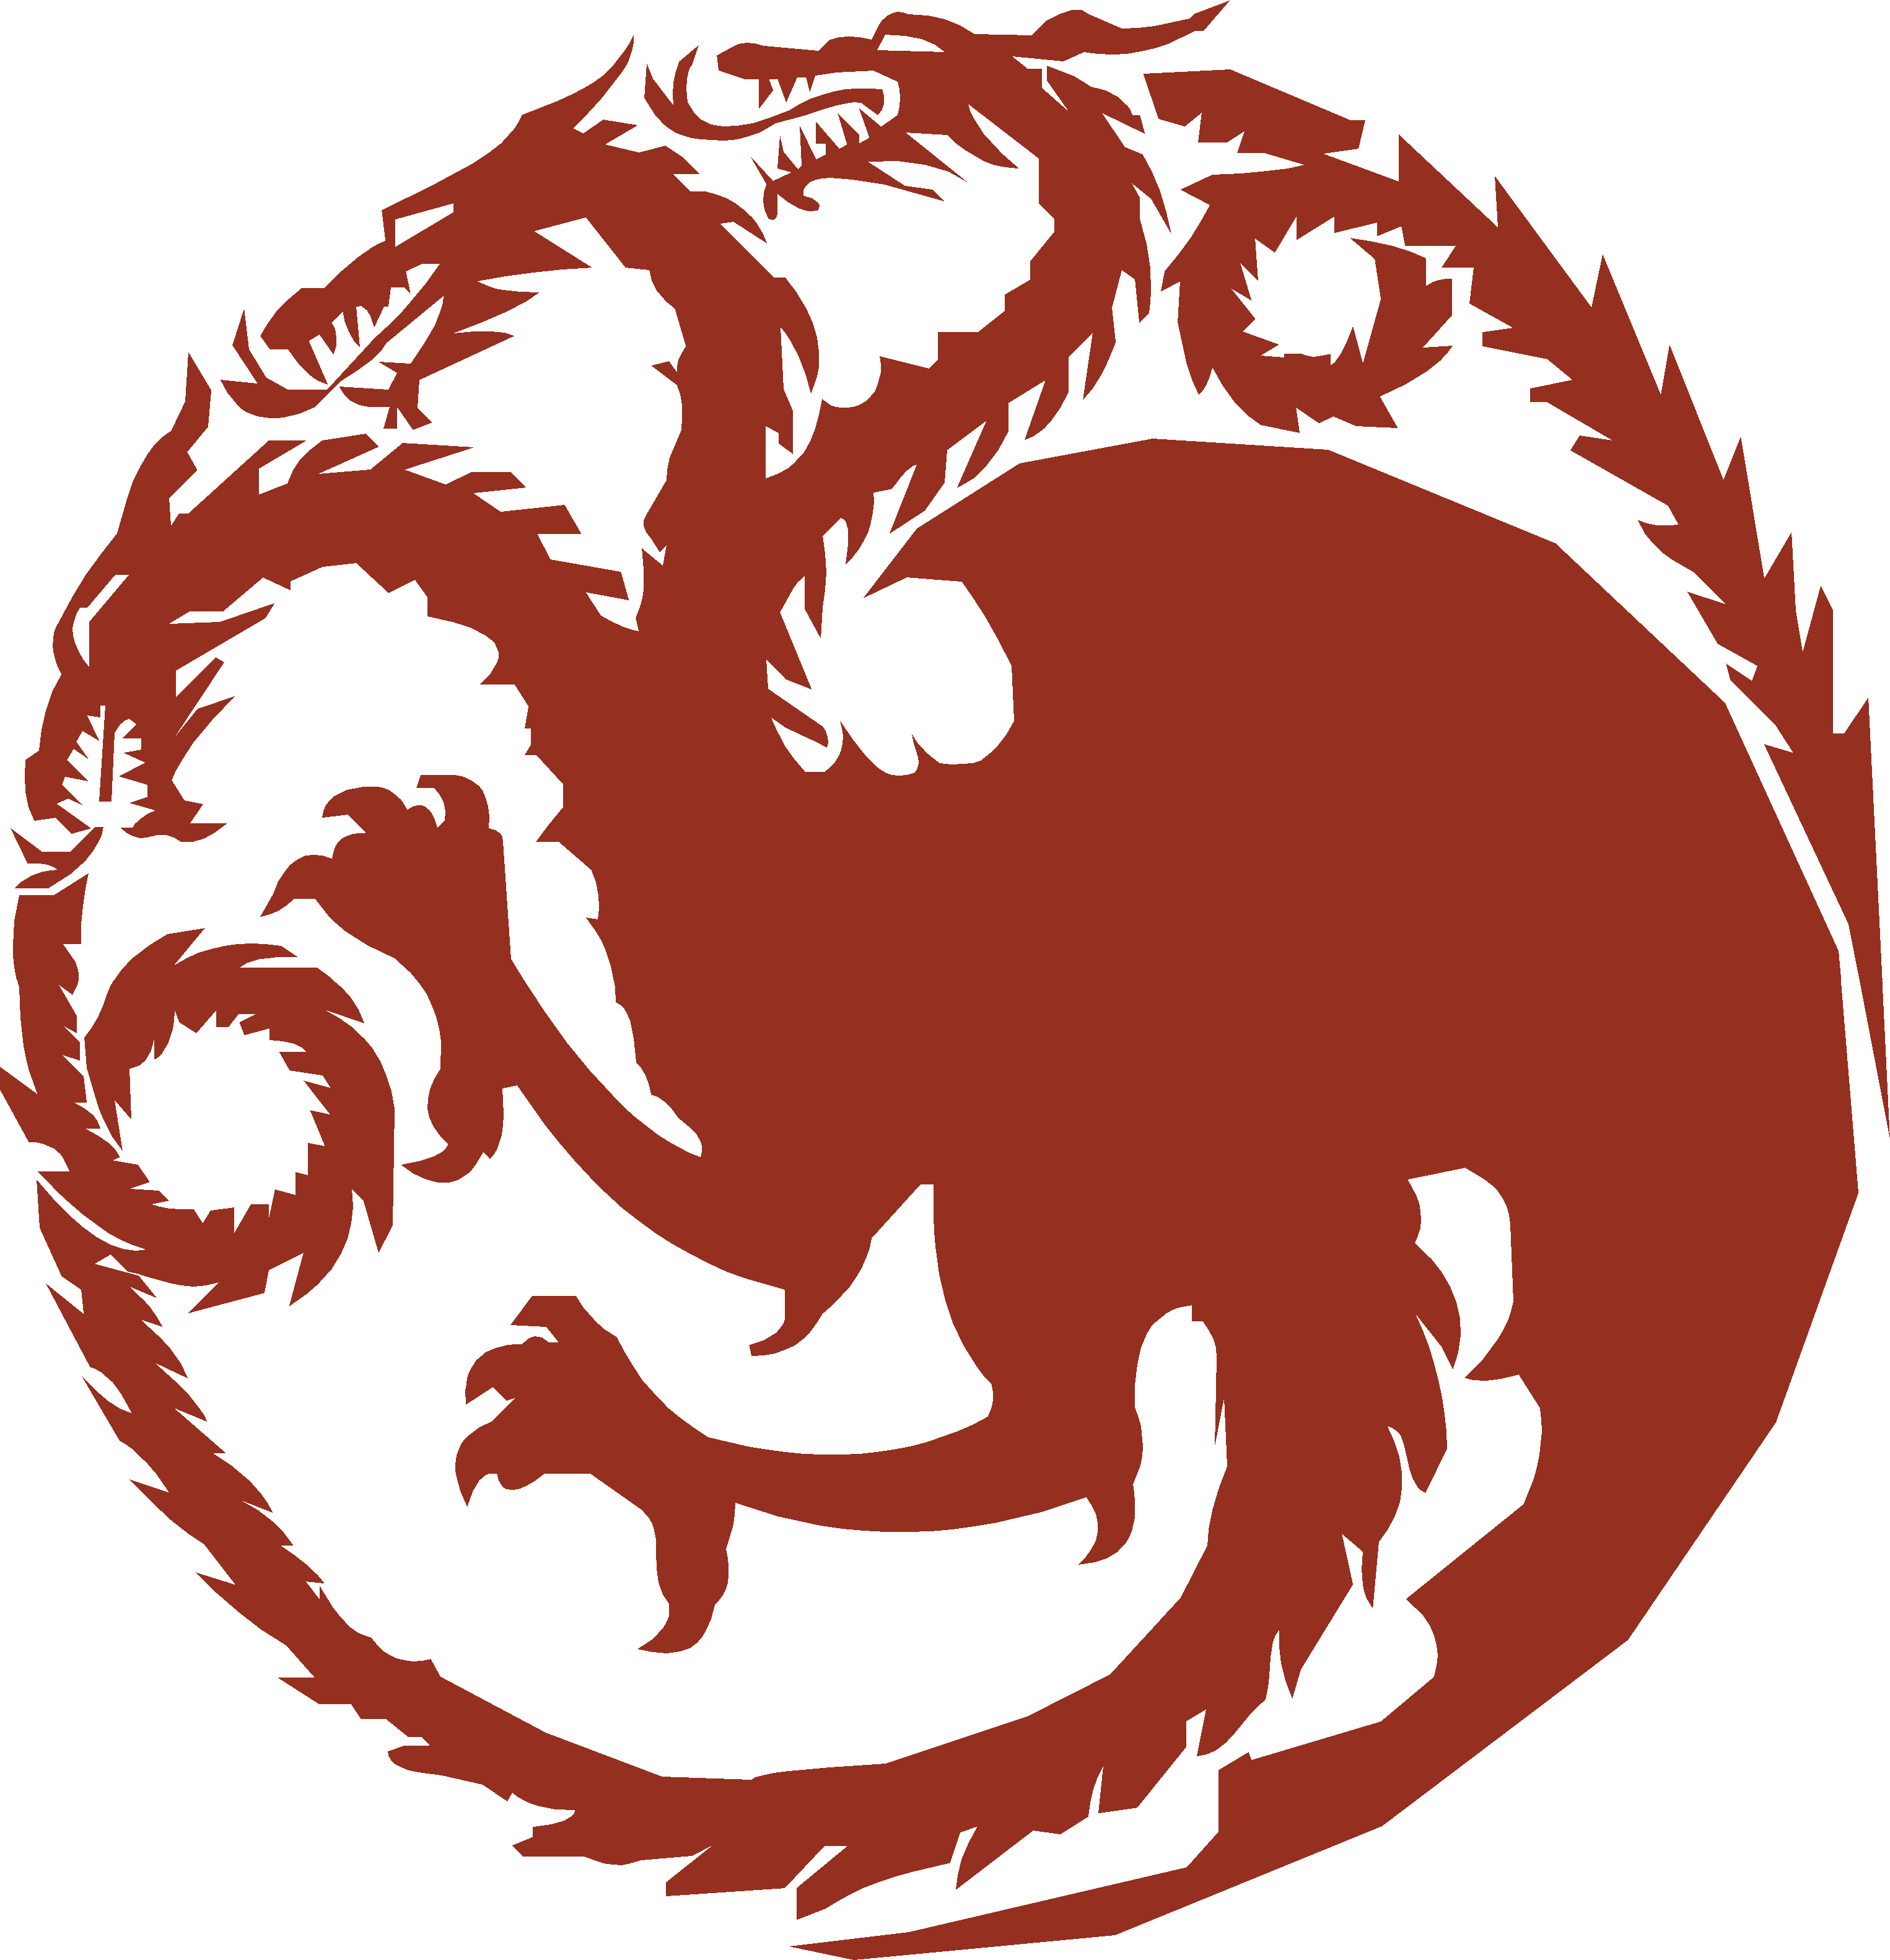 Daenerys Targaryen Tyrion Lannister House Targaryen Sigil.